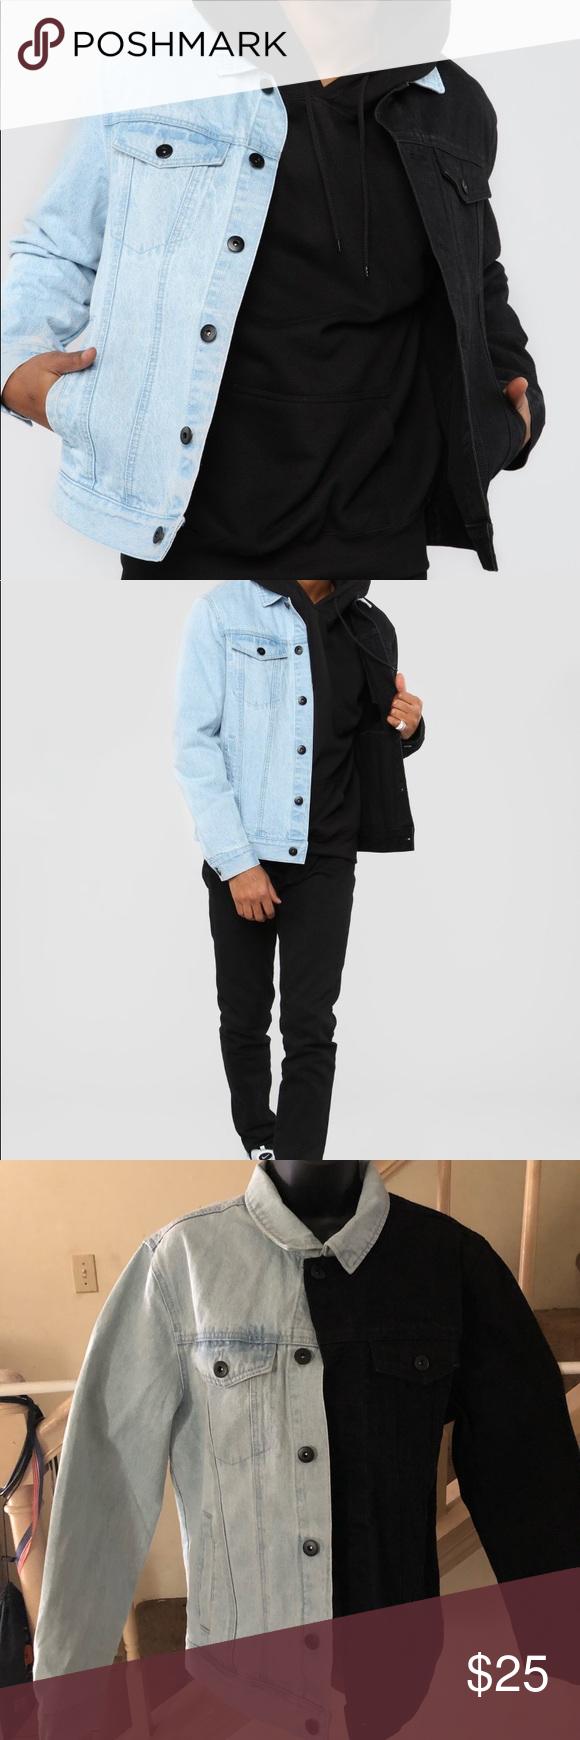 Two Tone Denim Jacket Black Combo Black Denim Jacket Denim Jacket Jackets